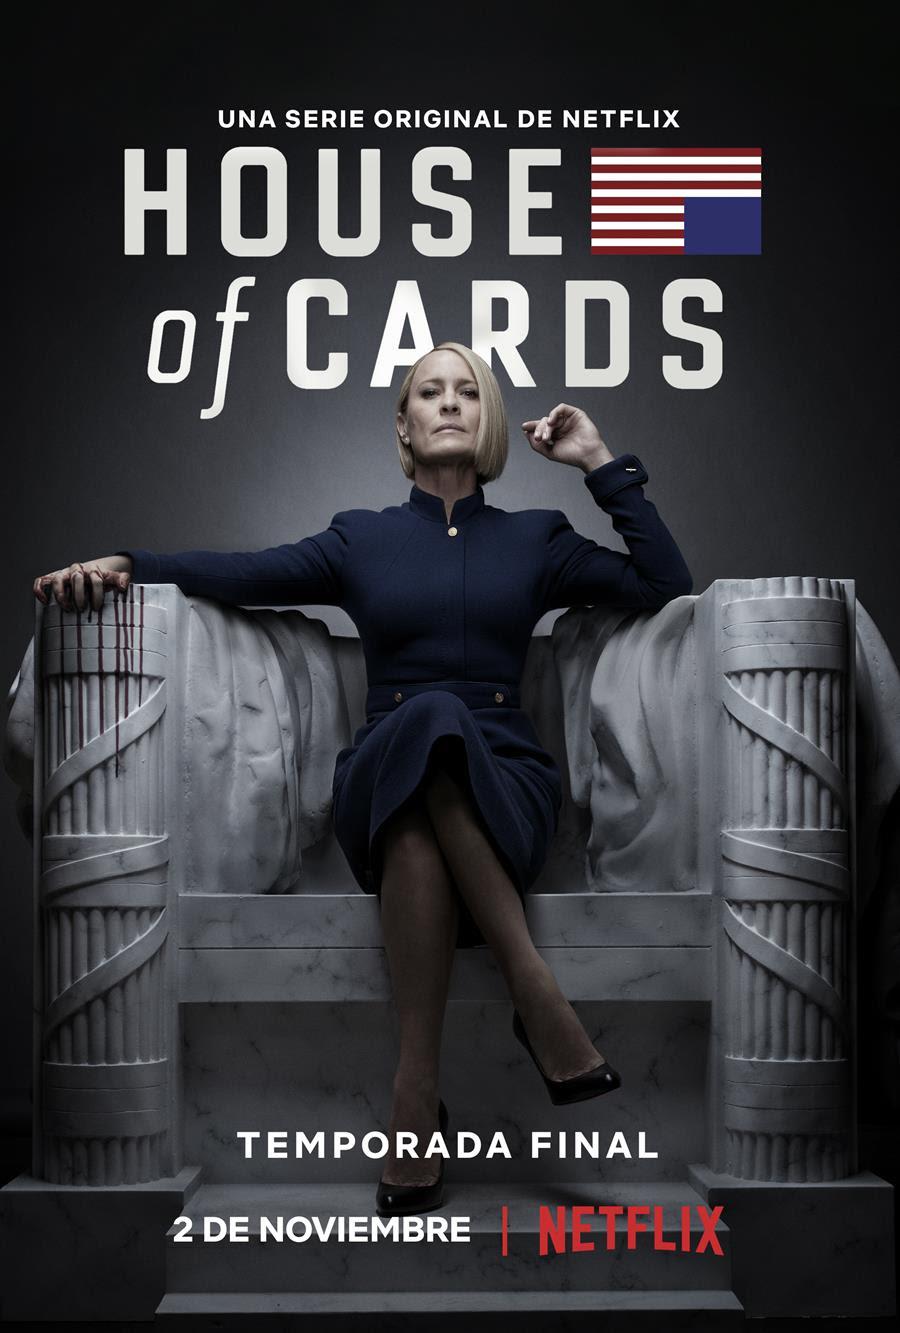 House of Cards Temporada final Poster.jpg